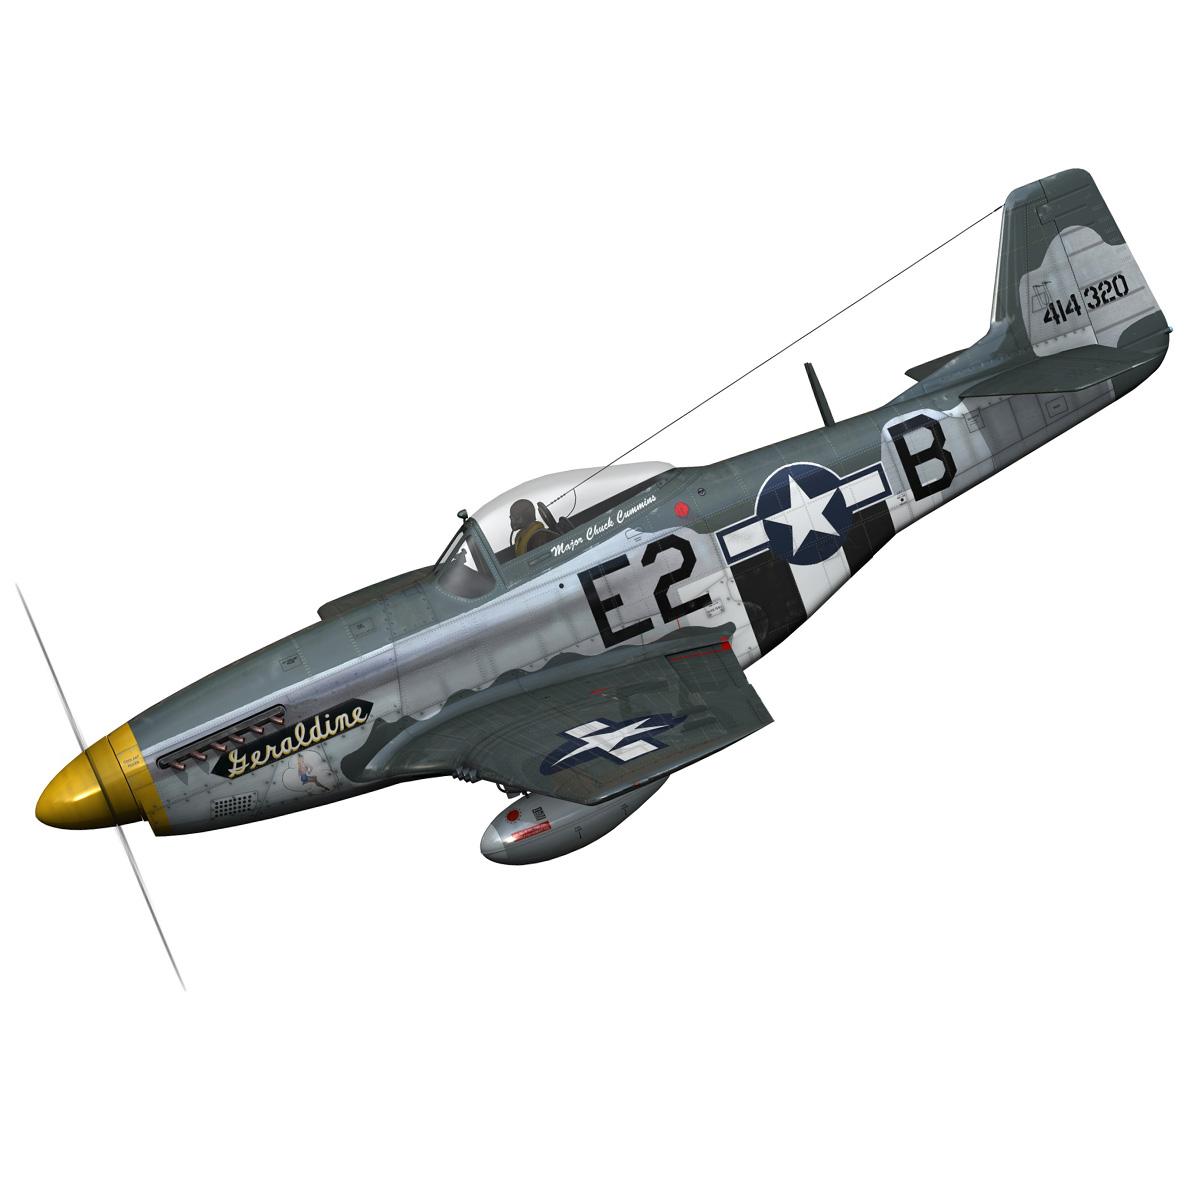 North American P-51D - Geraldine 3d model fbx c4d lwo obj 265938